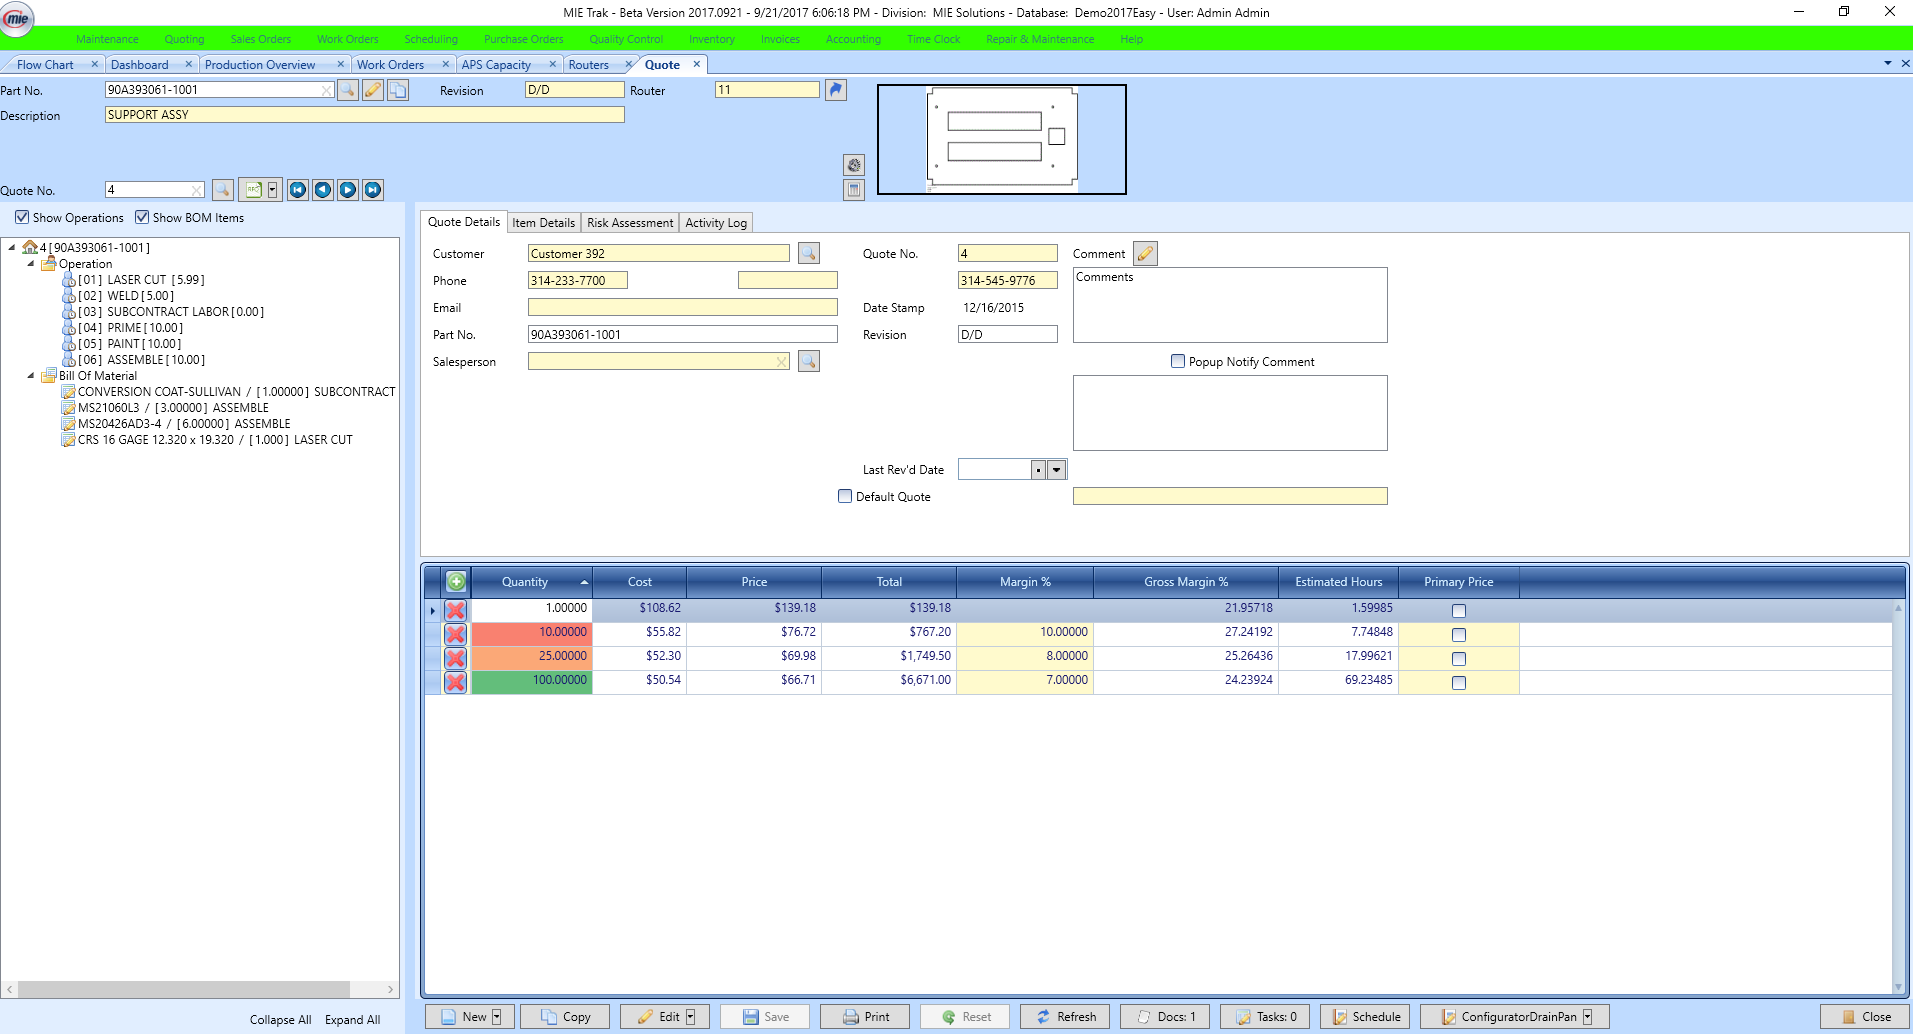 MIE Trak Pro Software - Quote screen